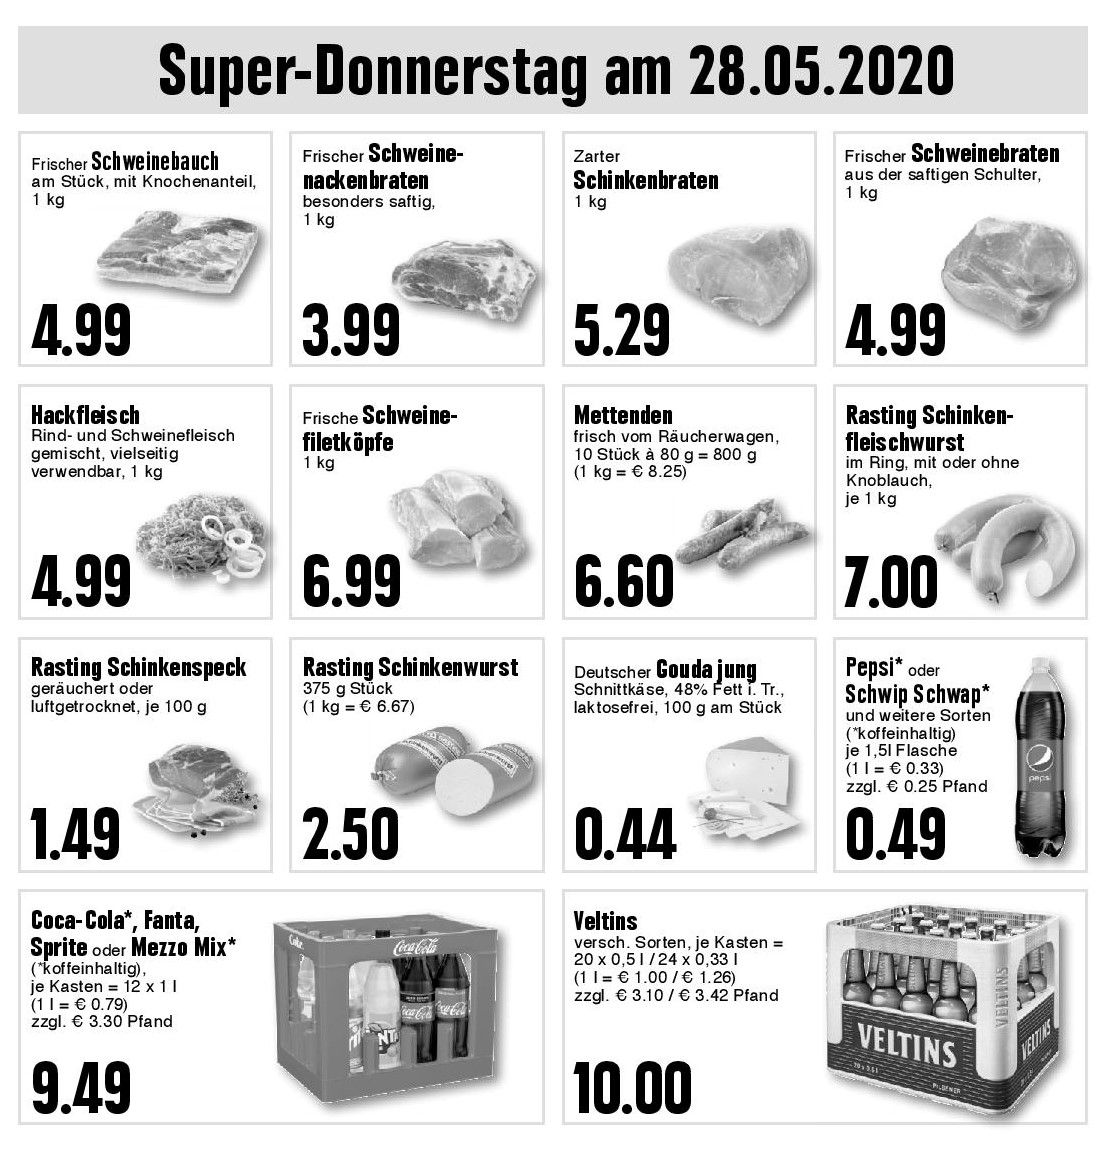 Super-Donnerstag am 28.05.2020